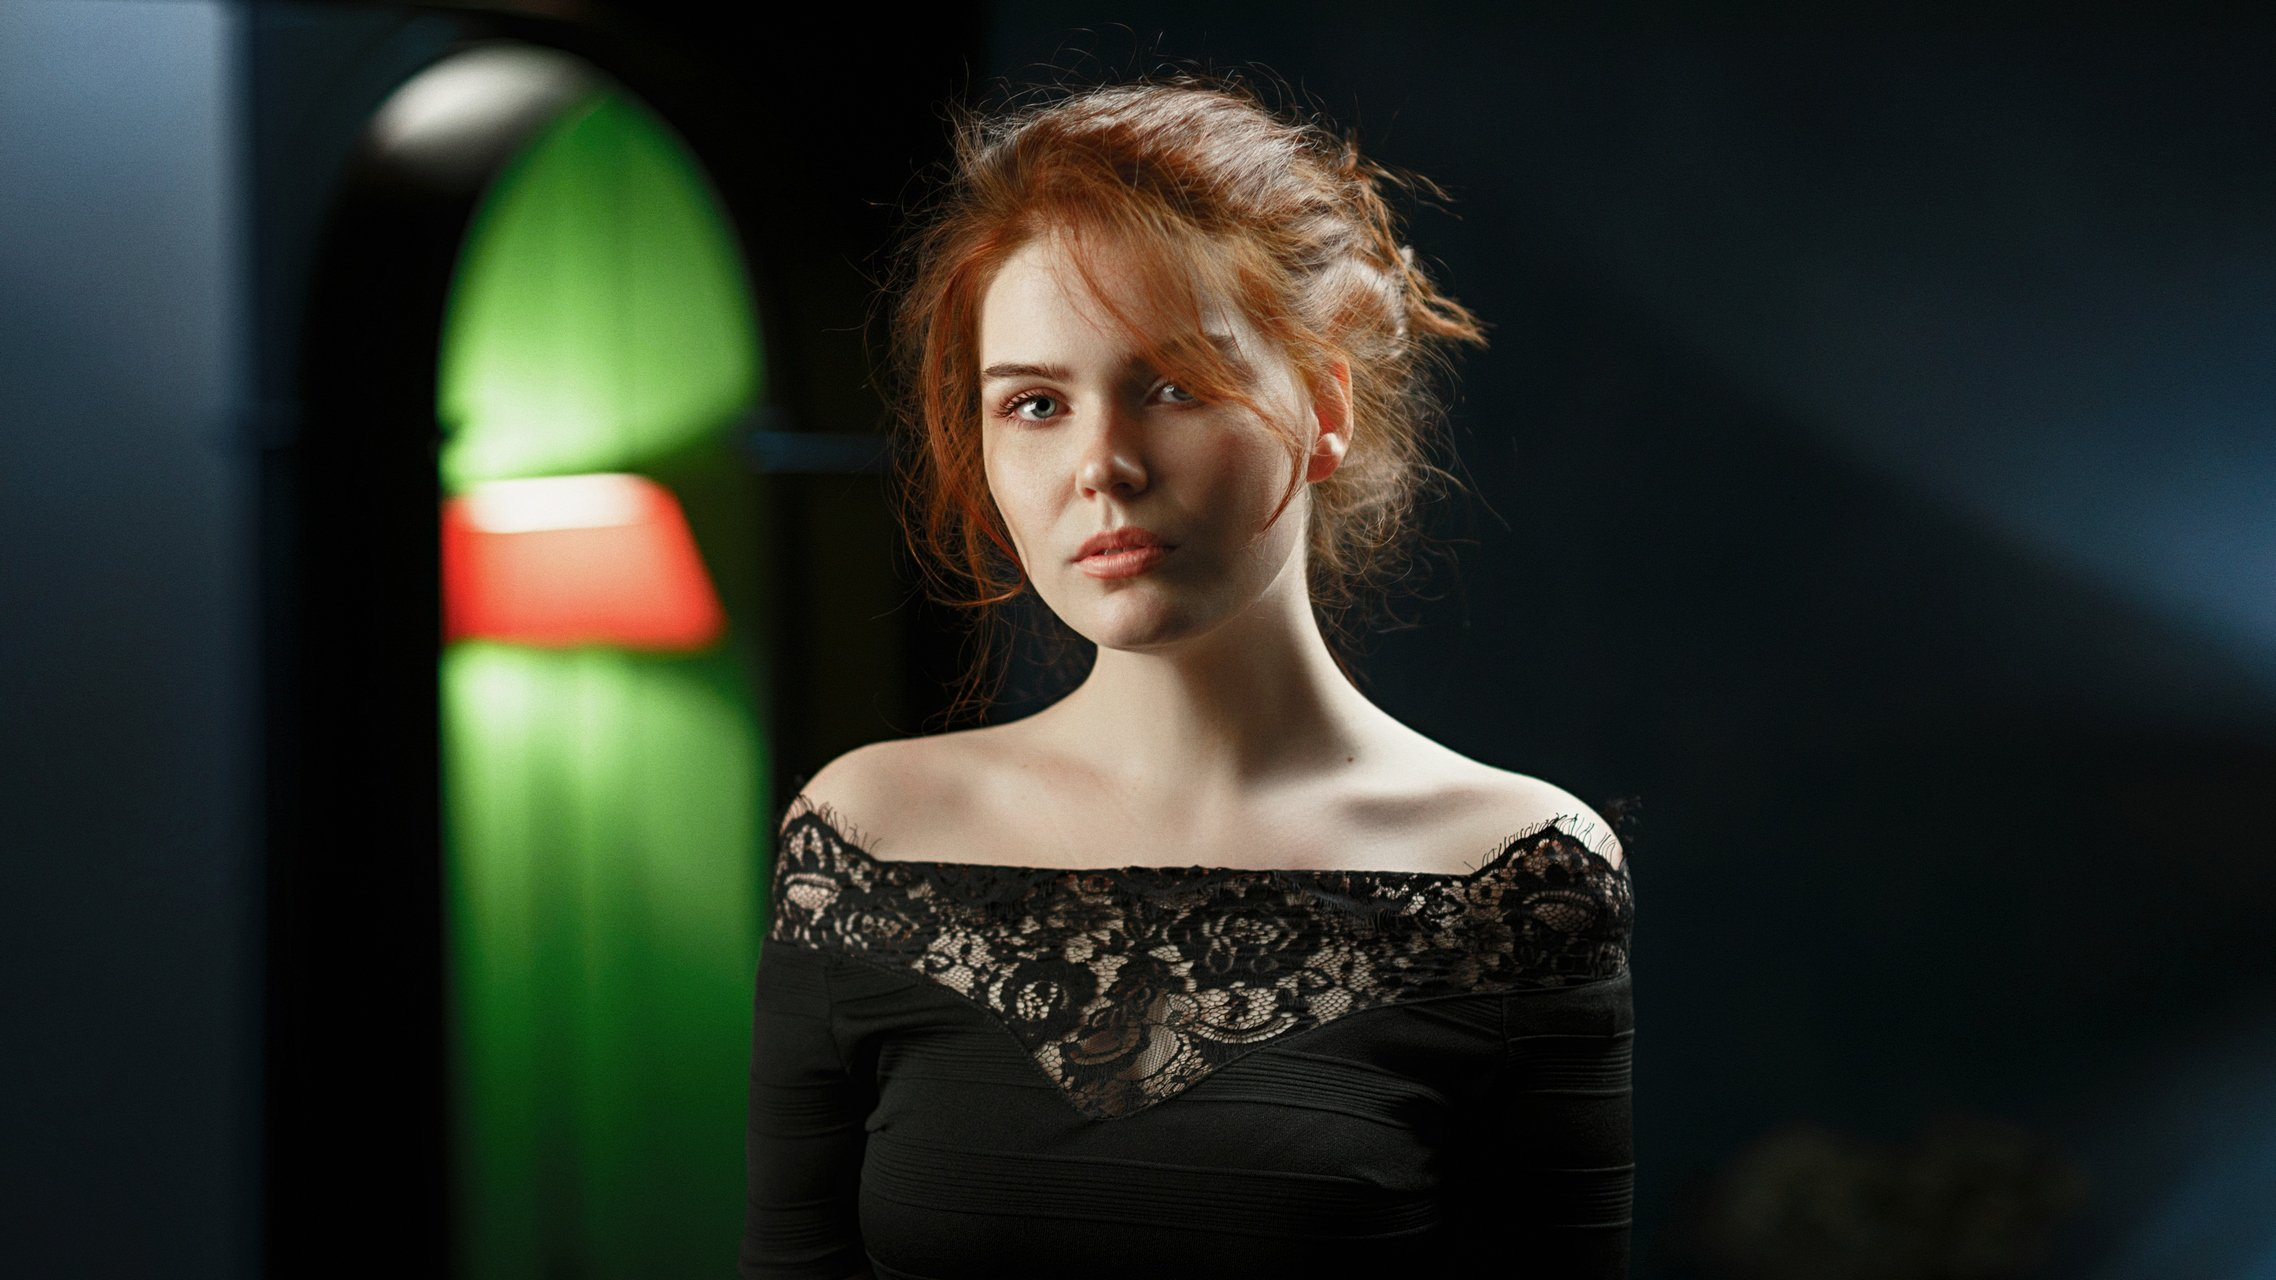 Angelina,portrait,girl,nikond750,, Черепко Павел